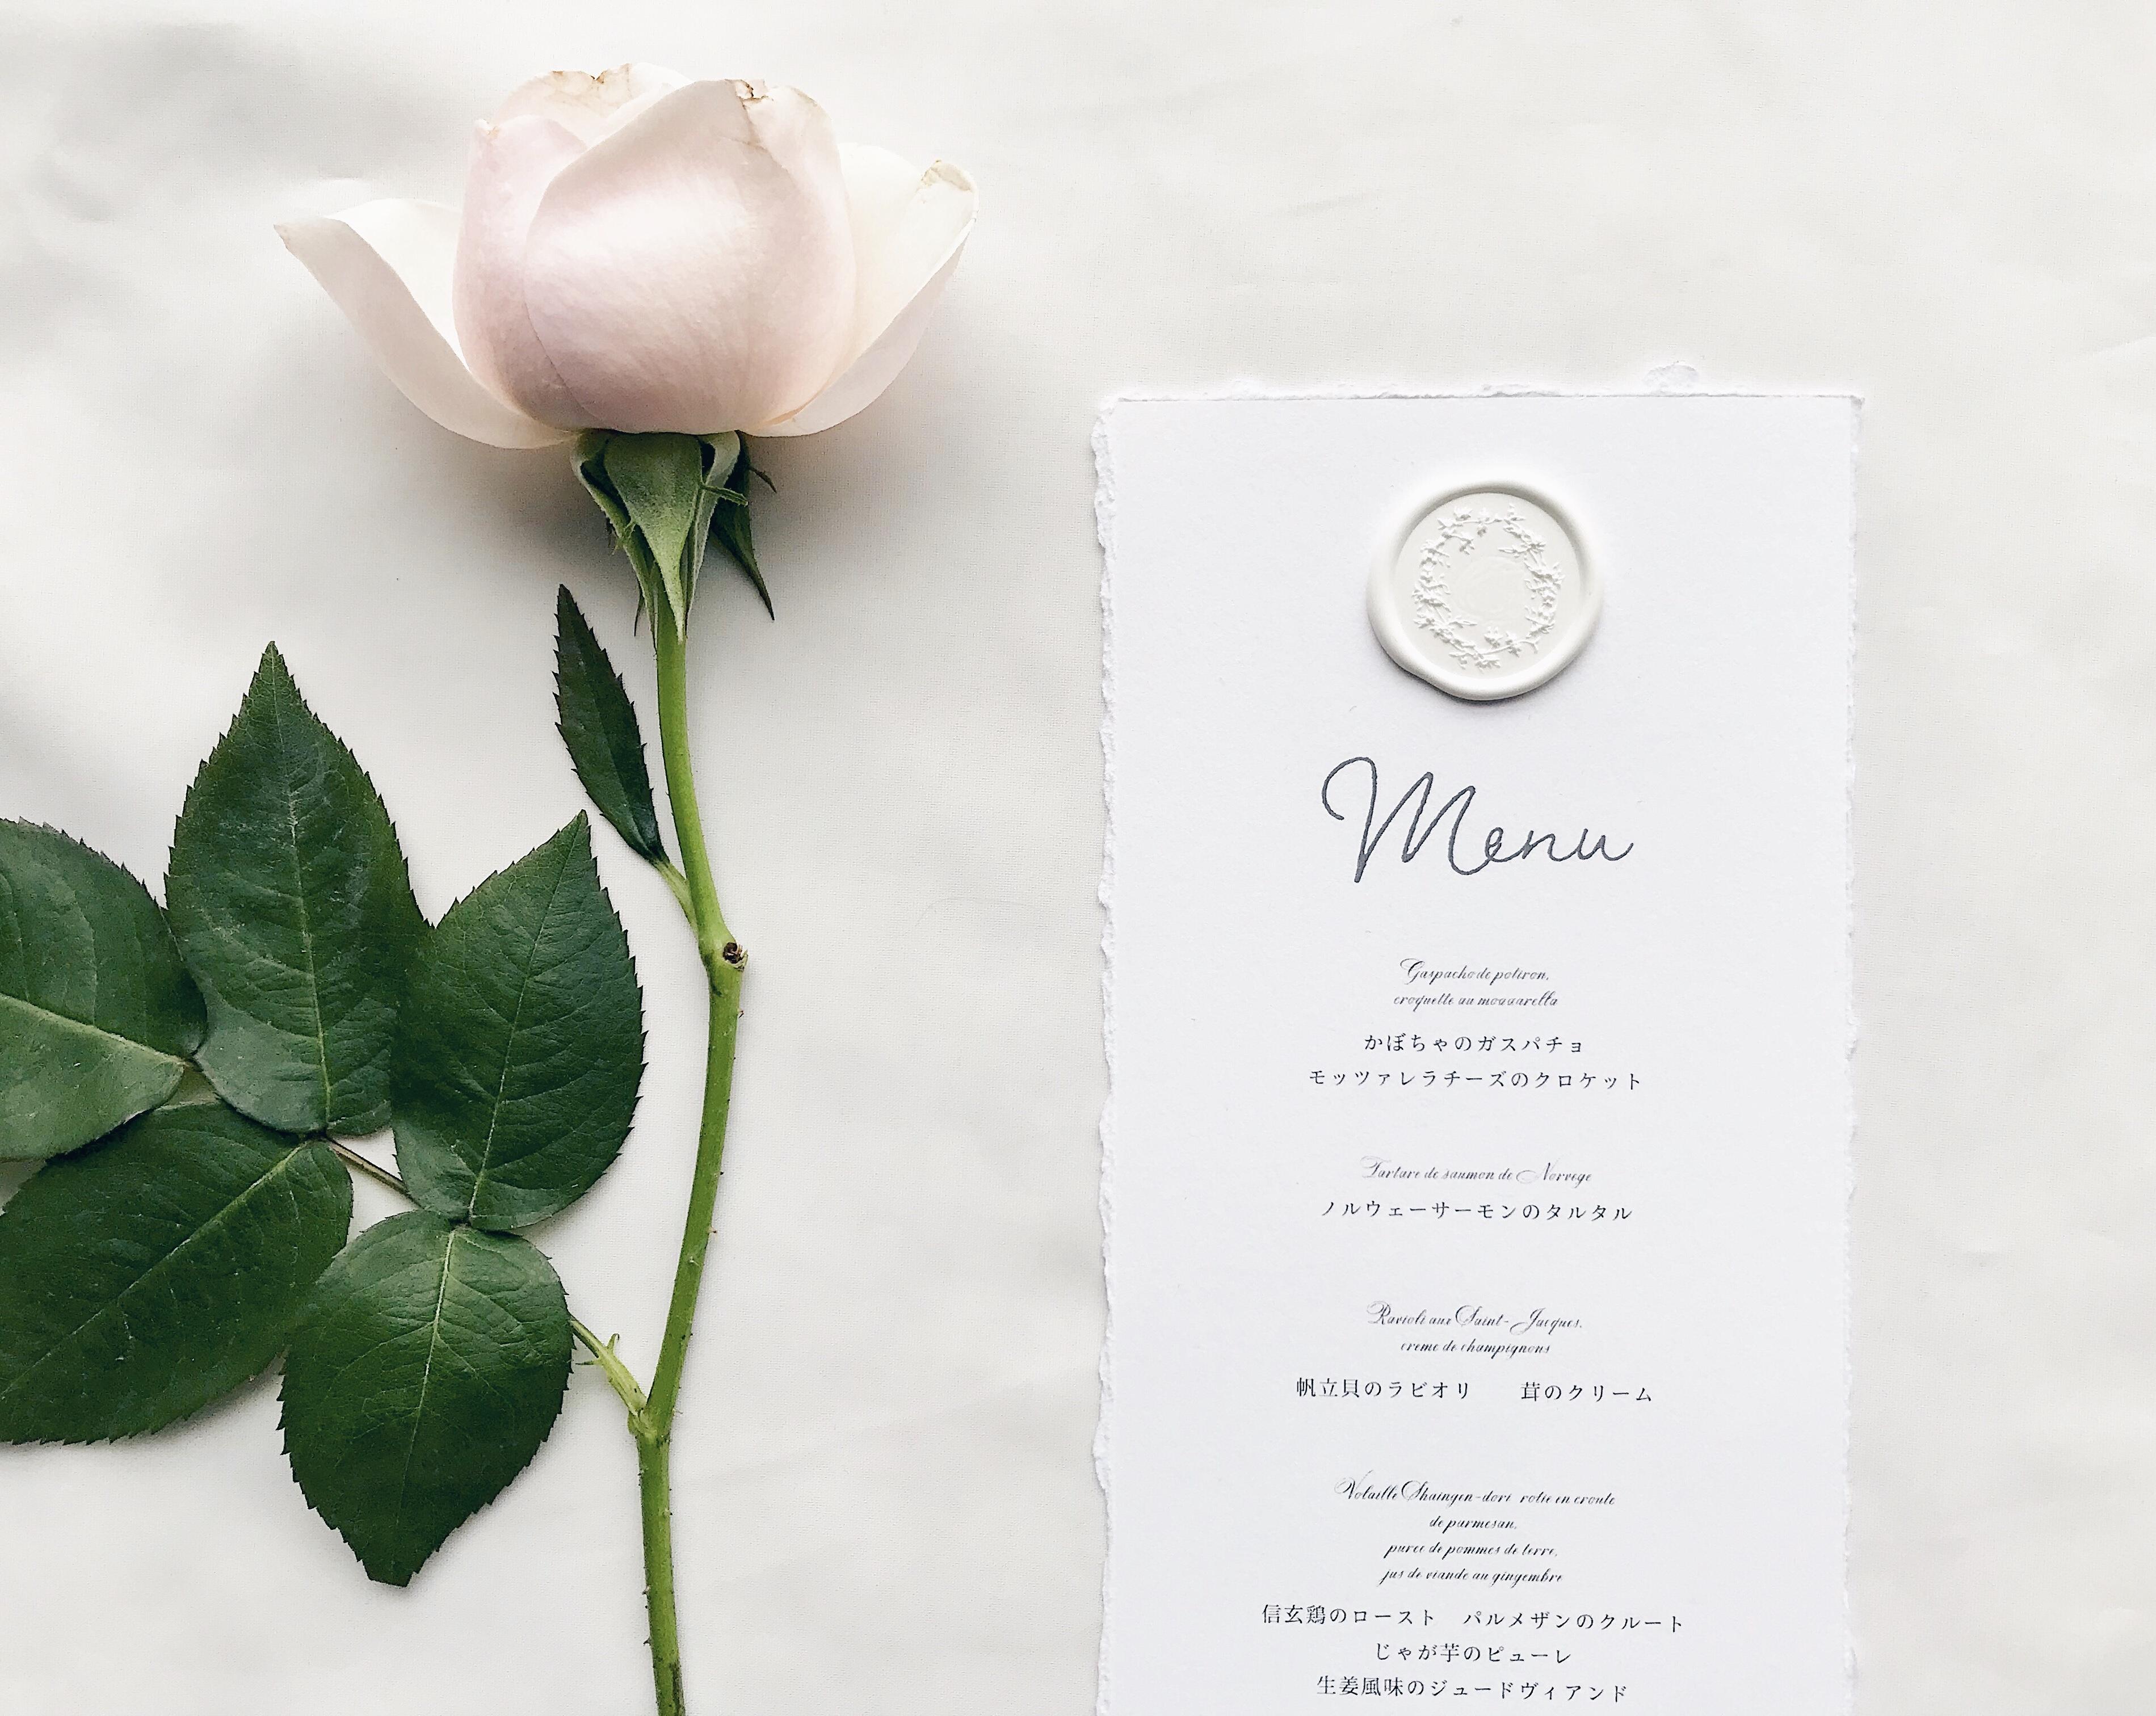 Sealing wax / menus